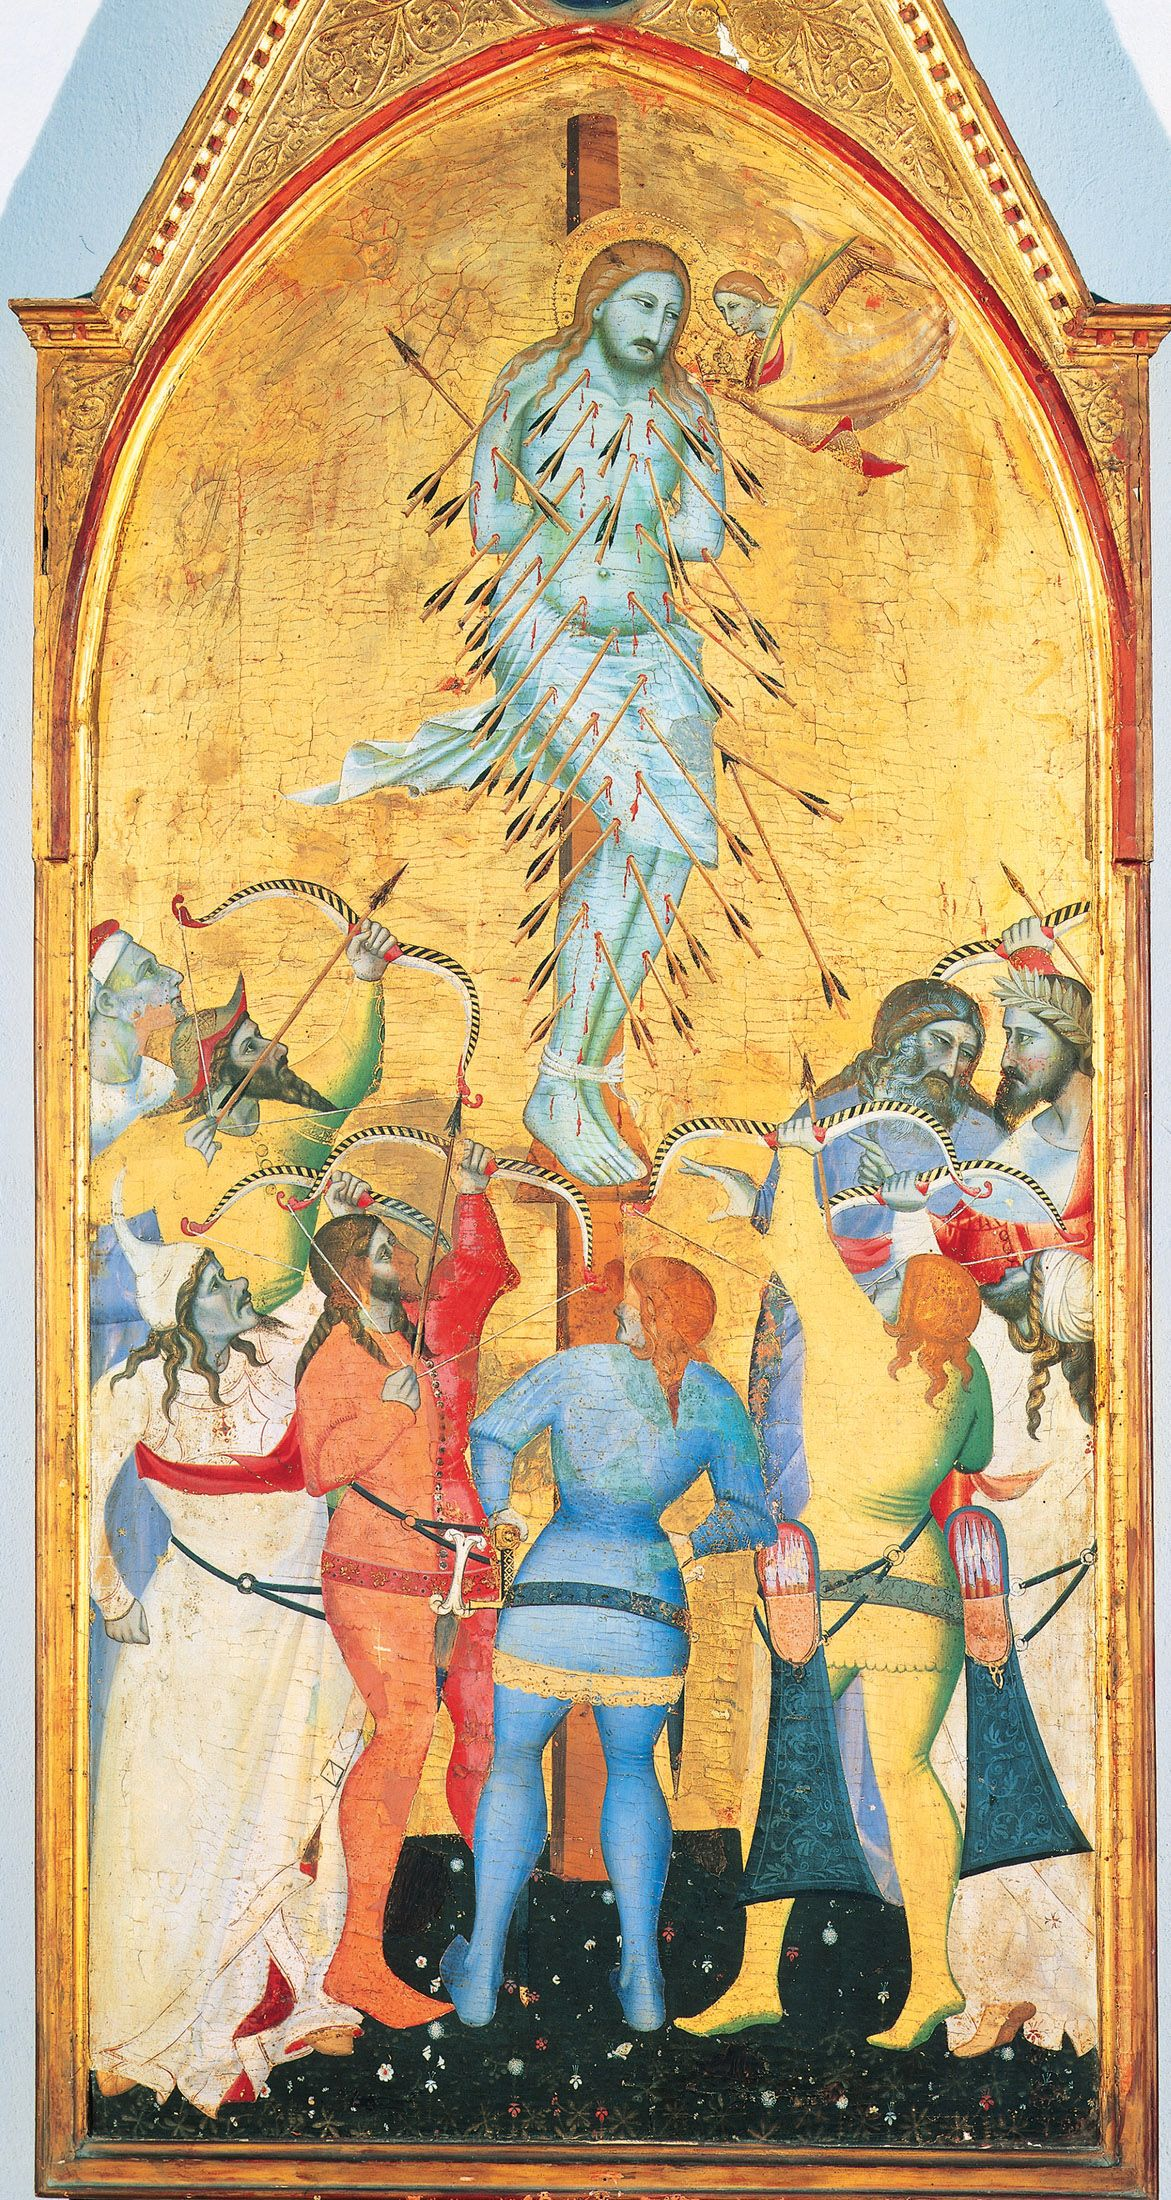 Giovanni Del Biondo Le Martyre De Saint Sébastien XIVe Si¨cle